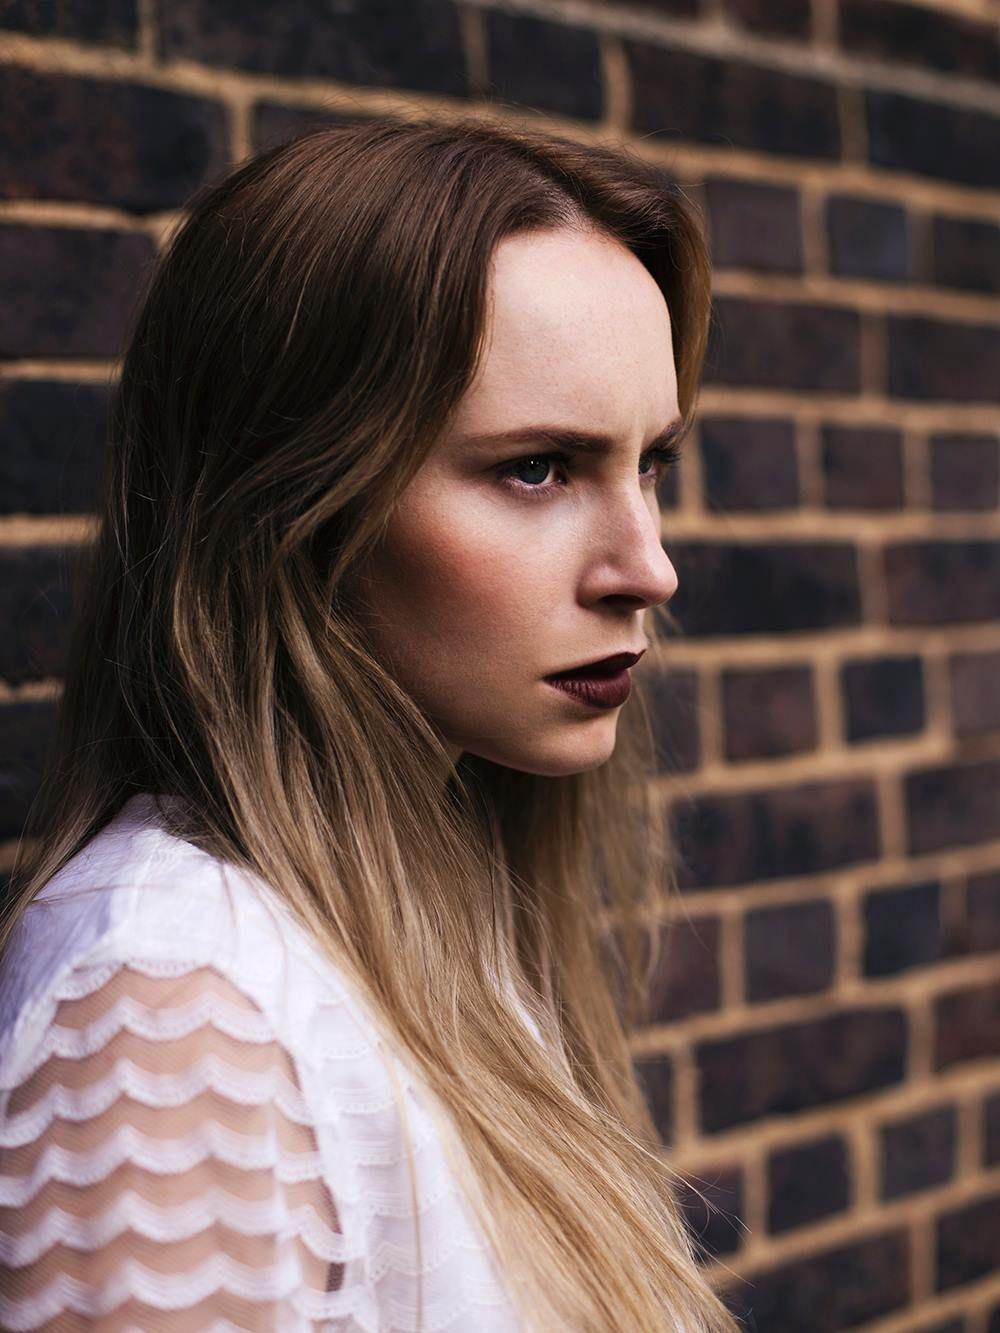 Photographer: Emma Flewers Model: Holly Weston Makeup: Albieleo #editorialmakeup #makeup #photoshoot #London #Hackney